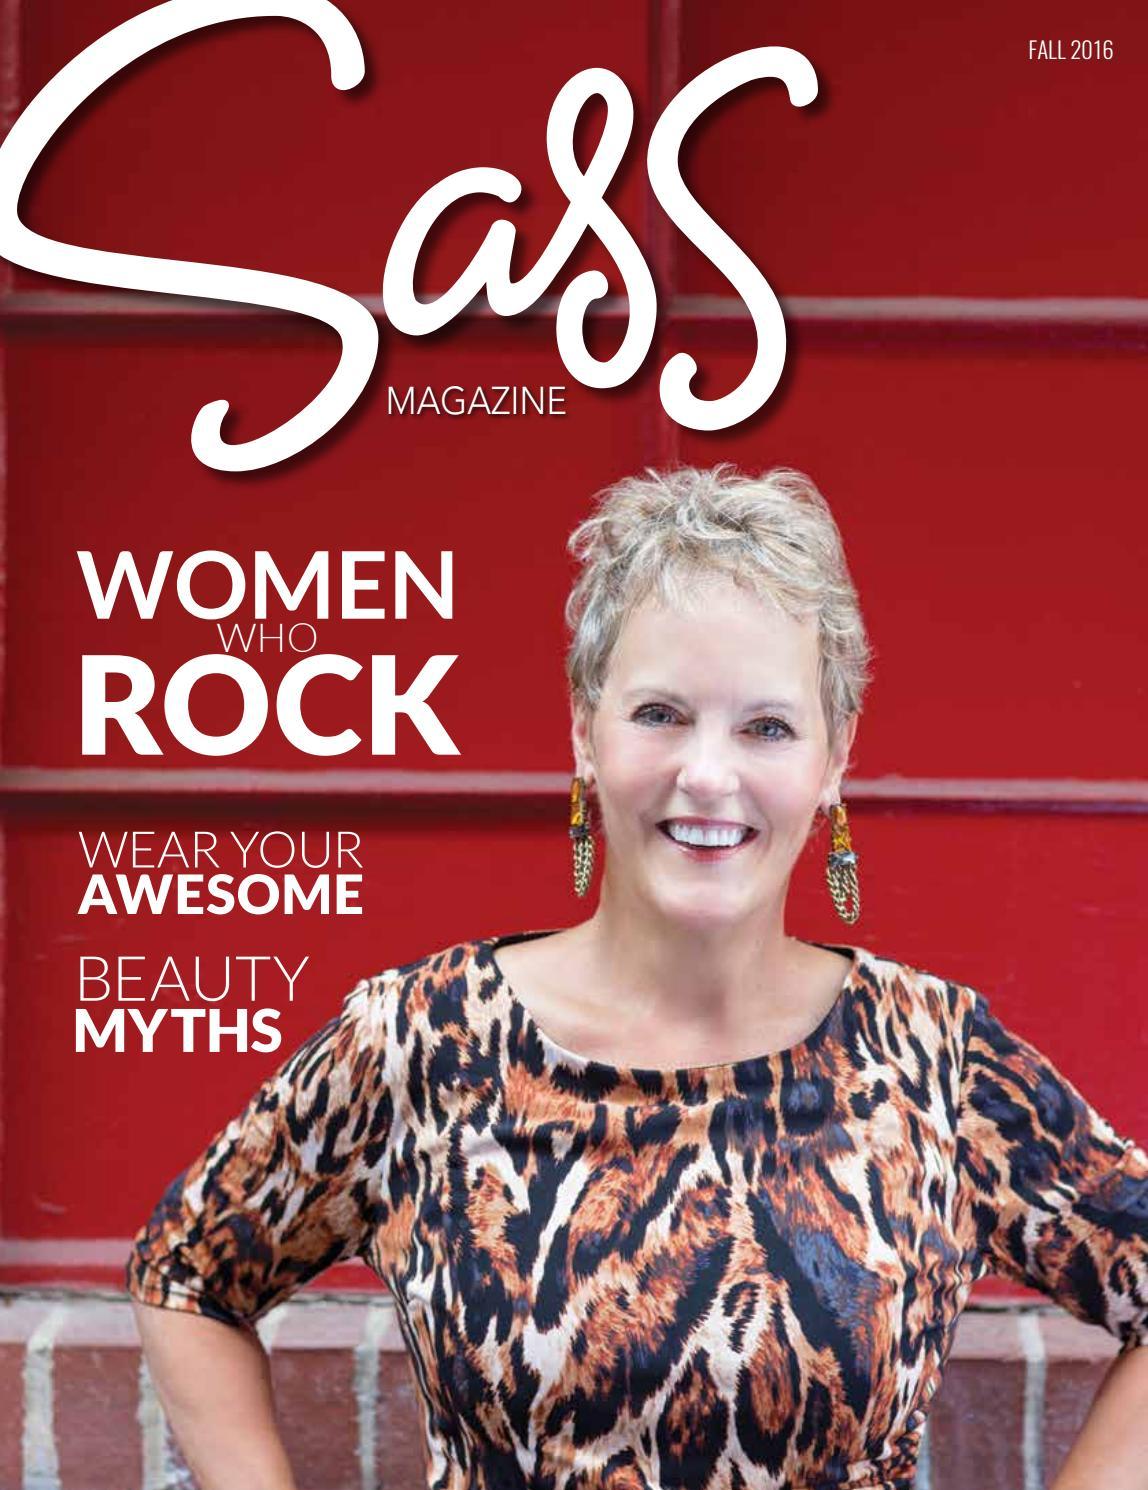 ce3a67afbab Sass Fall 2016 by Sass Magazine Frederick - issuu